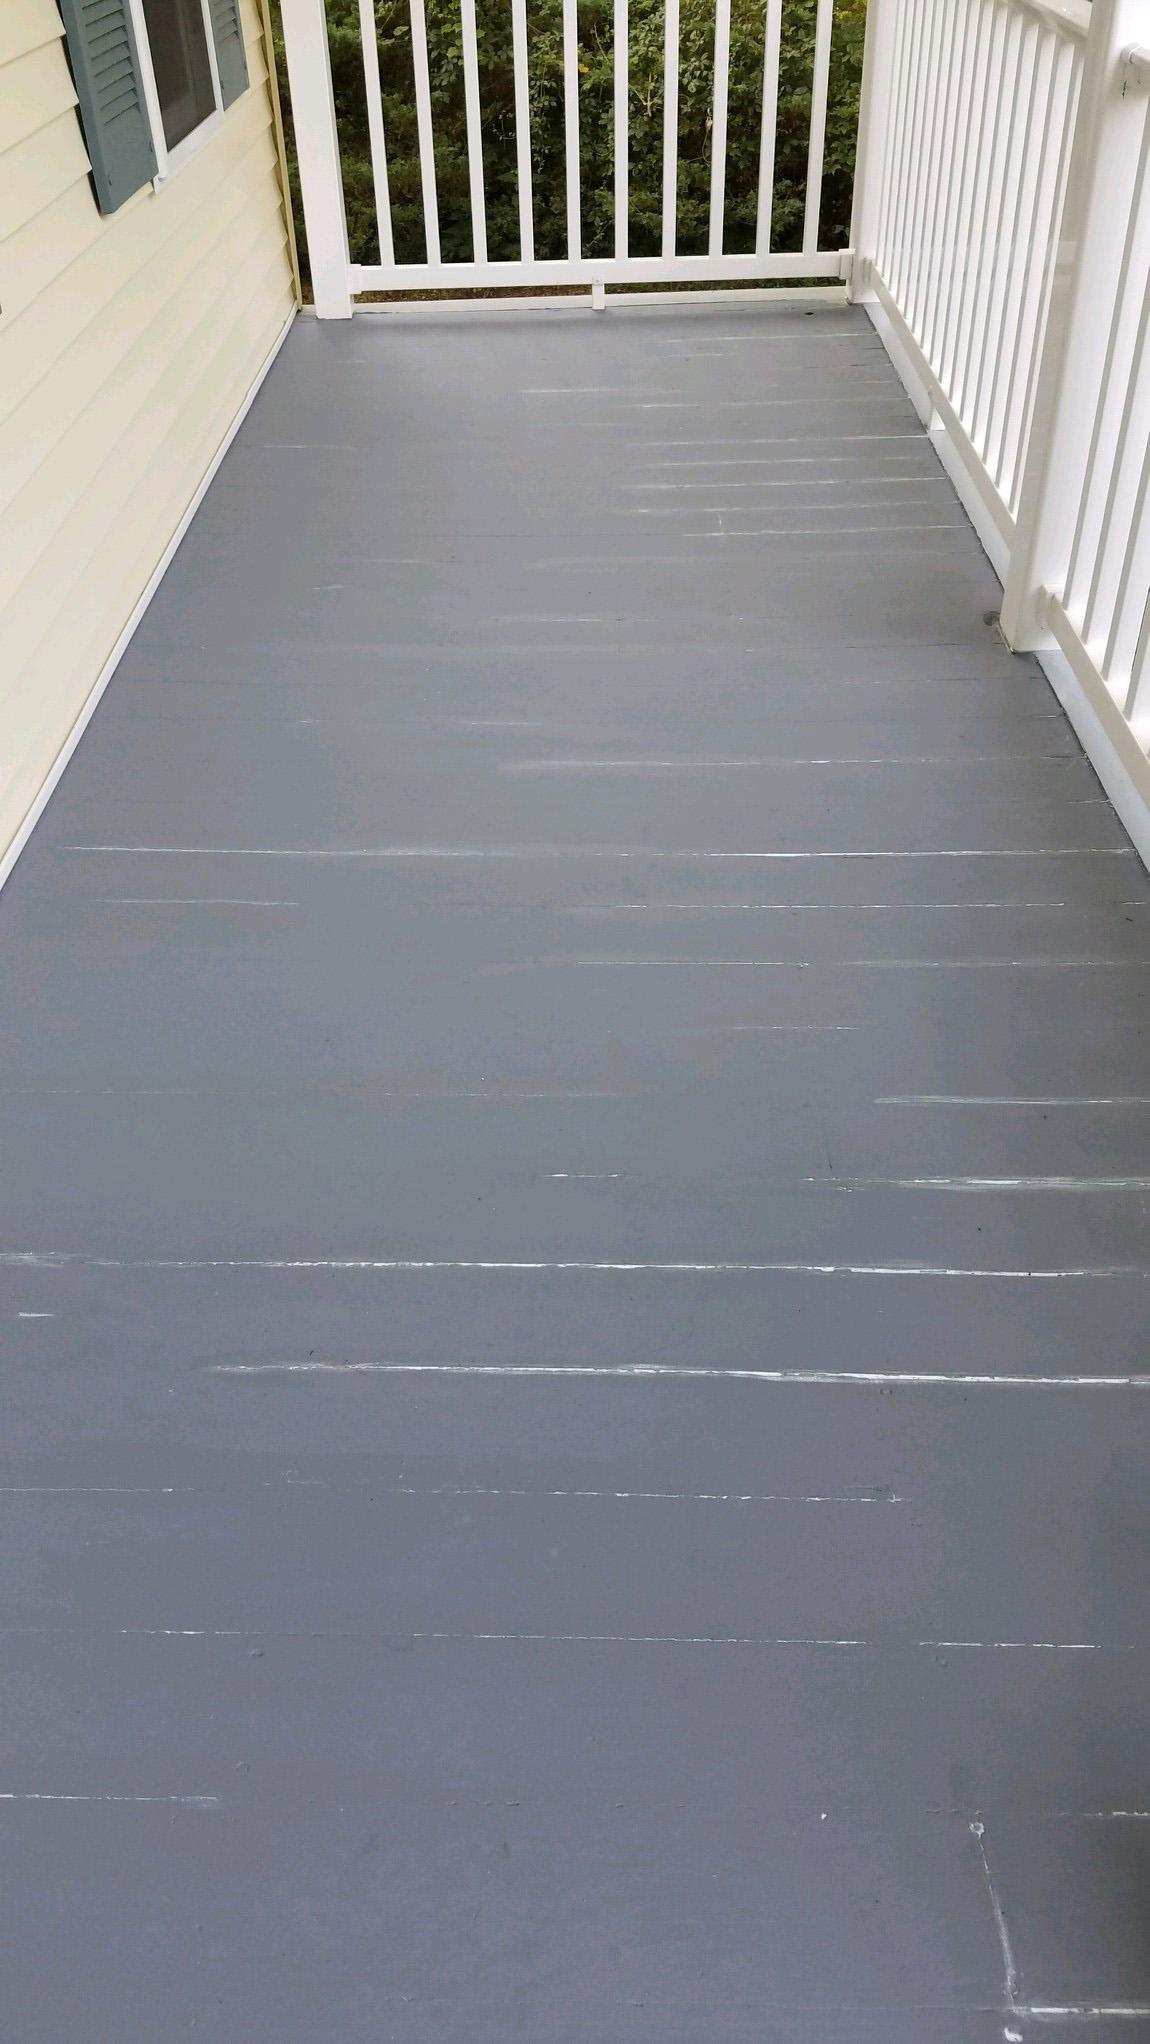 vintage-painting-deck-before-caulking